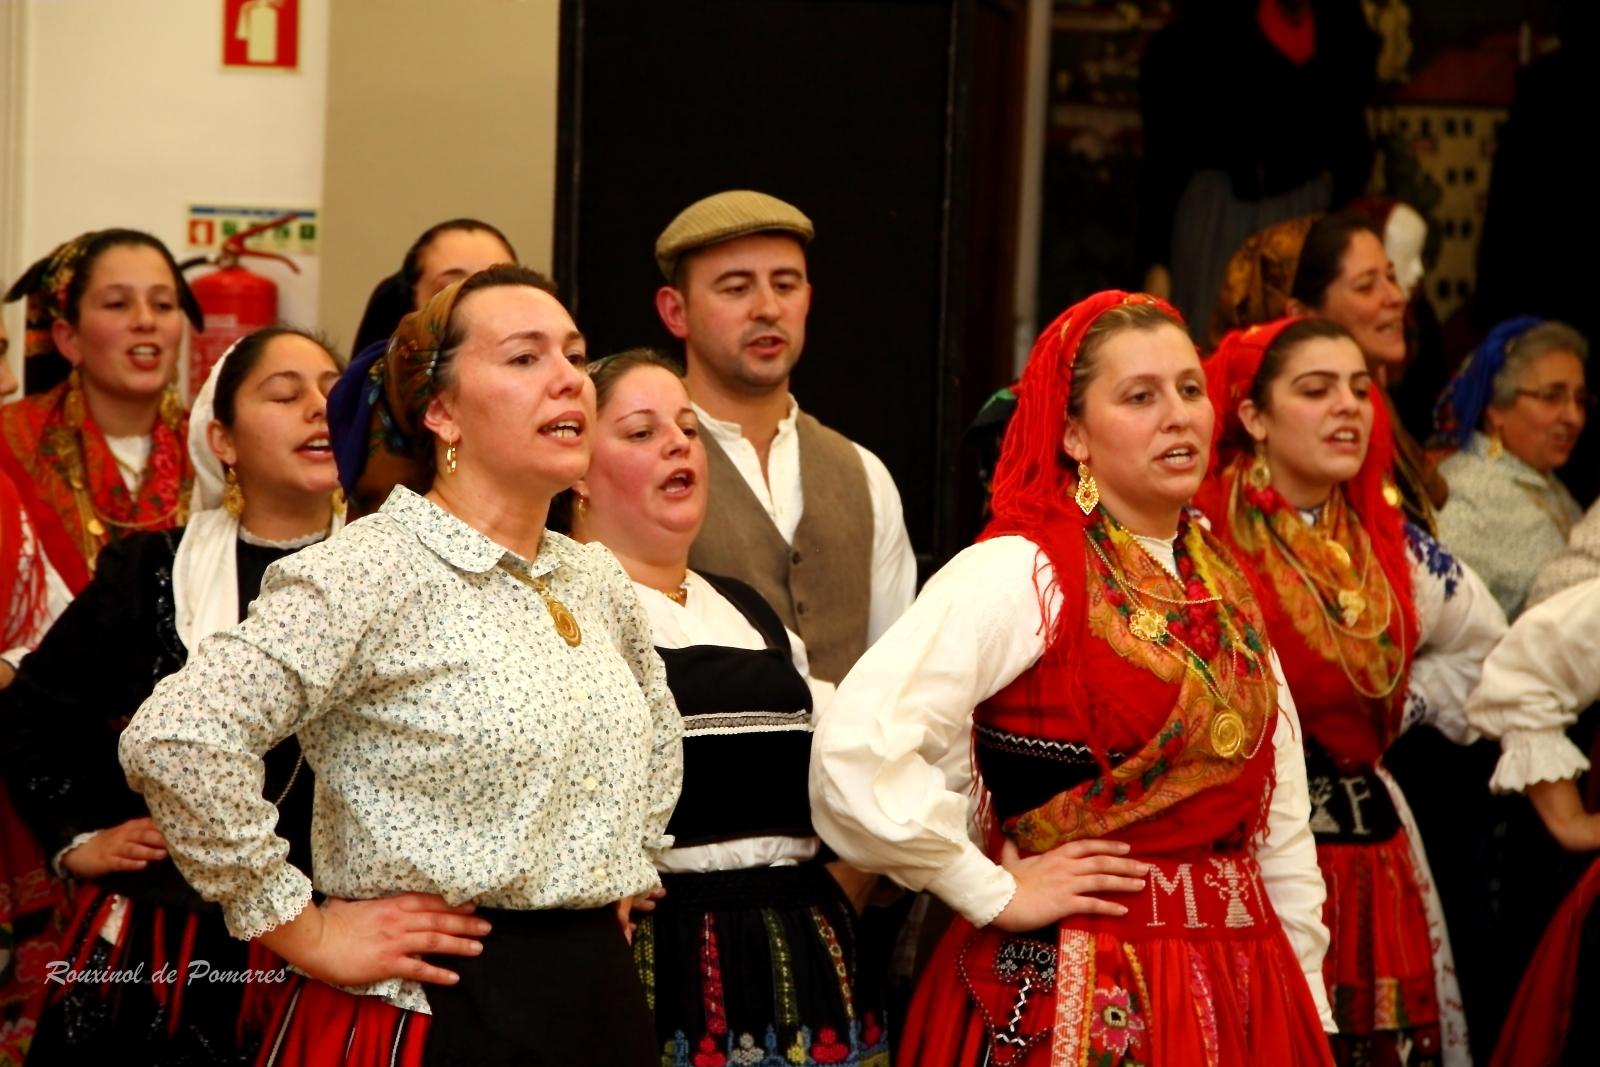 Festa Regionalista Casa da Comarca (0020)